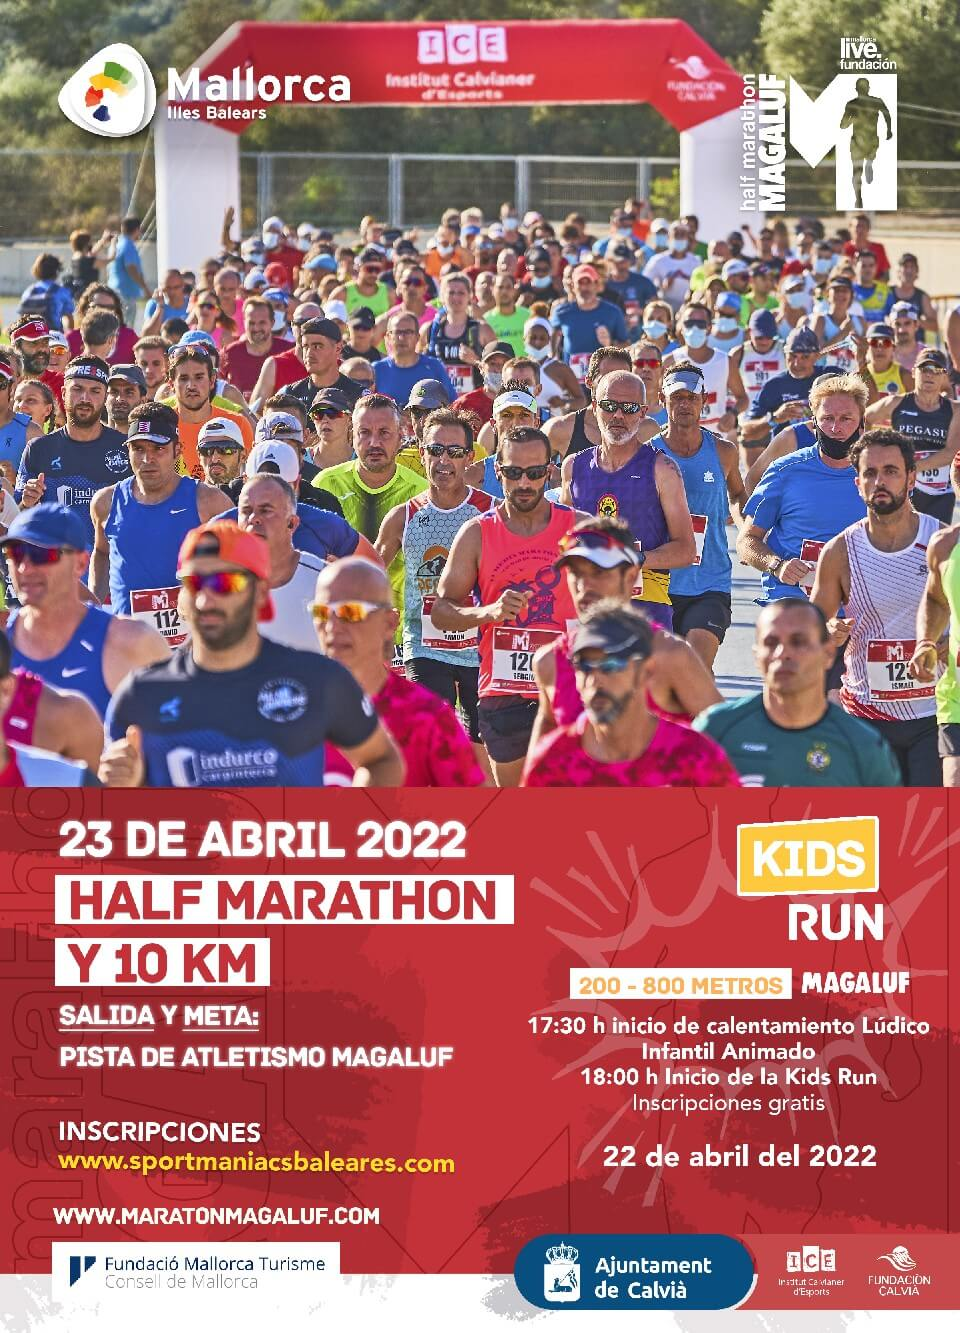 Half Marathon Magaluf